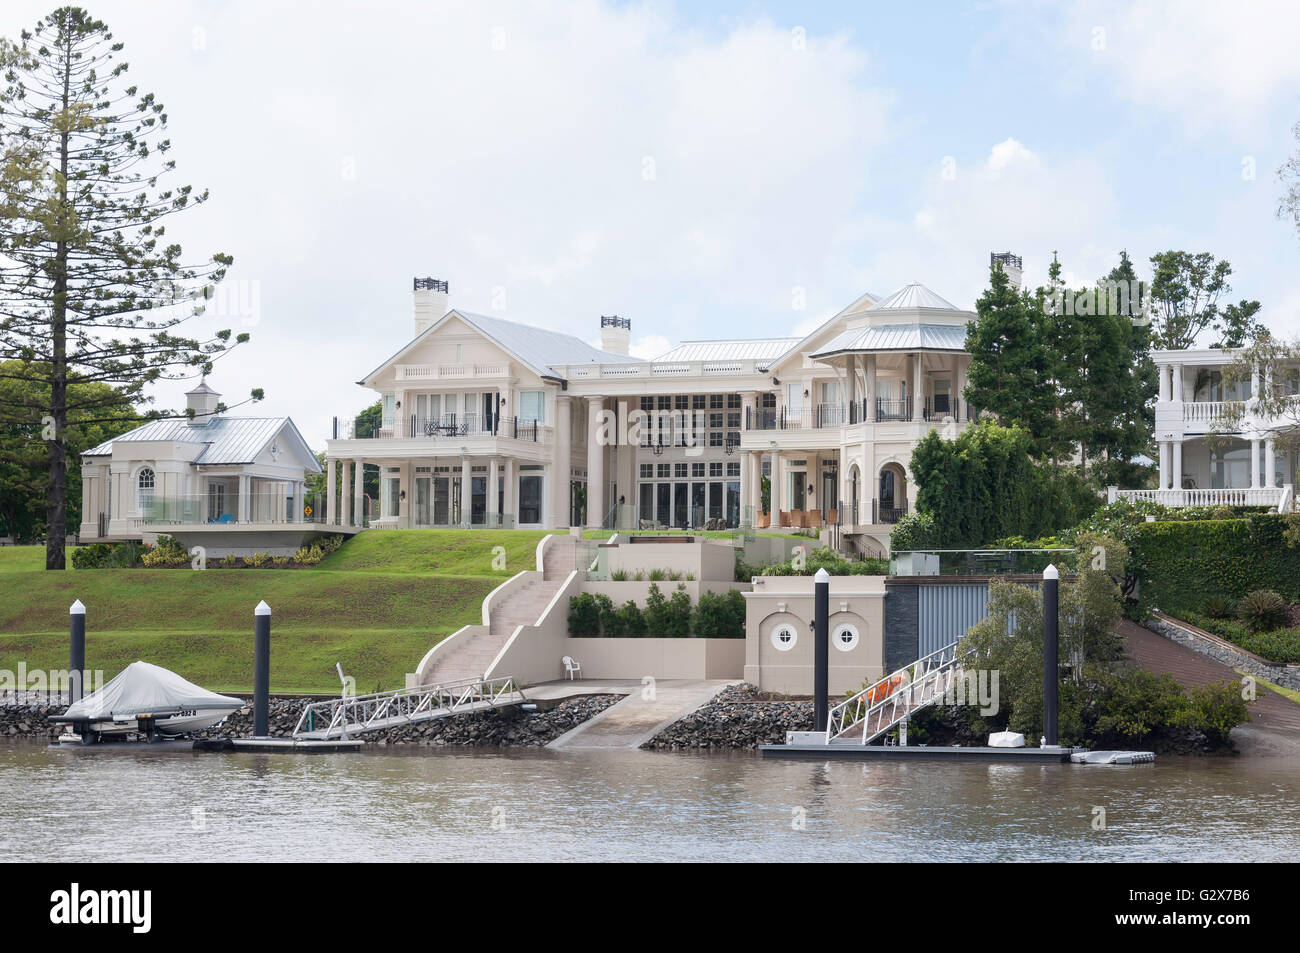 Luxury riverside house on Brisbane River, Fig Tree Pocket, Brisbane, Queensland, Australia Stock Photo